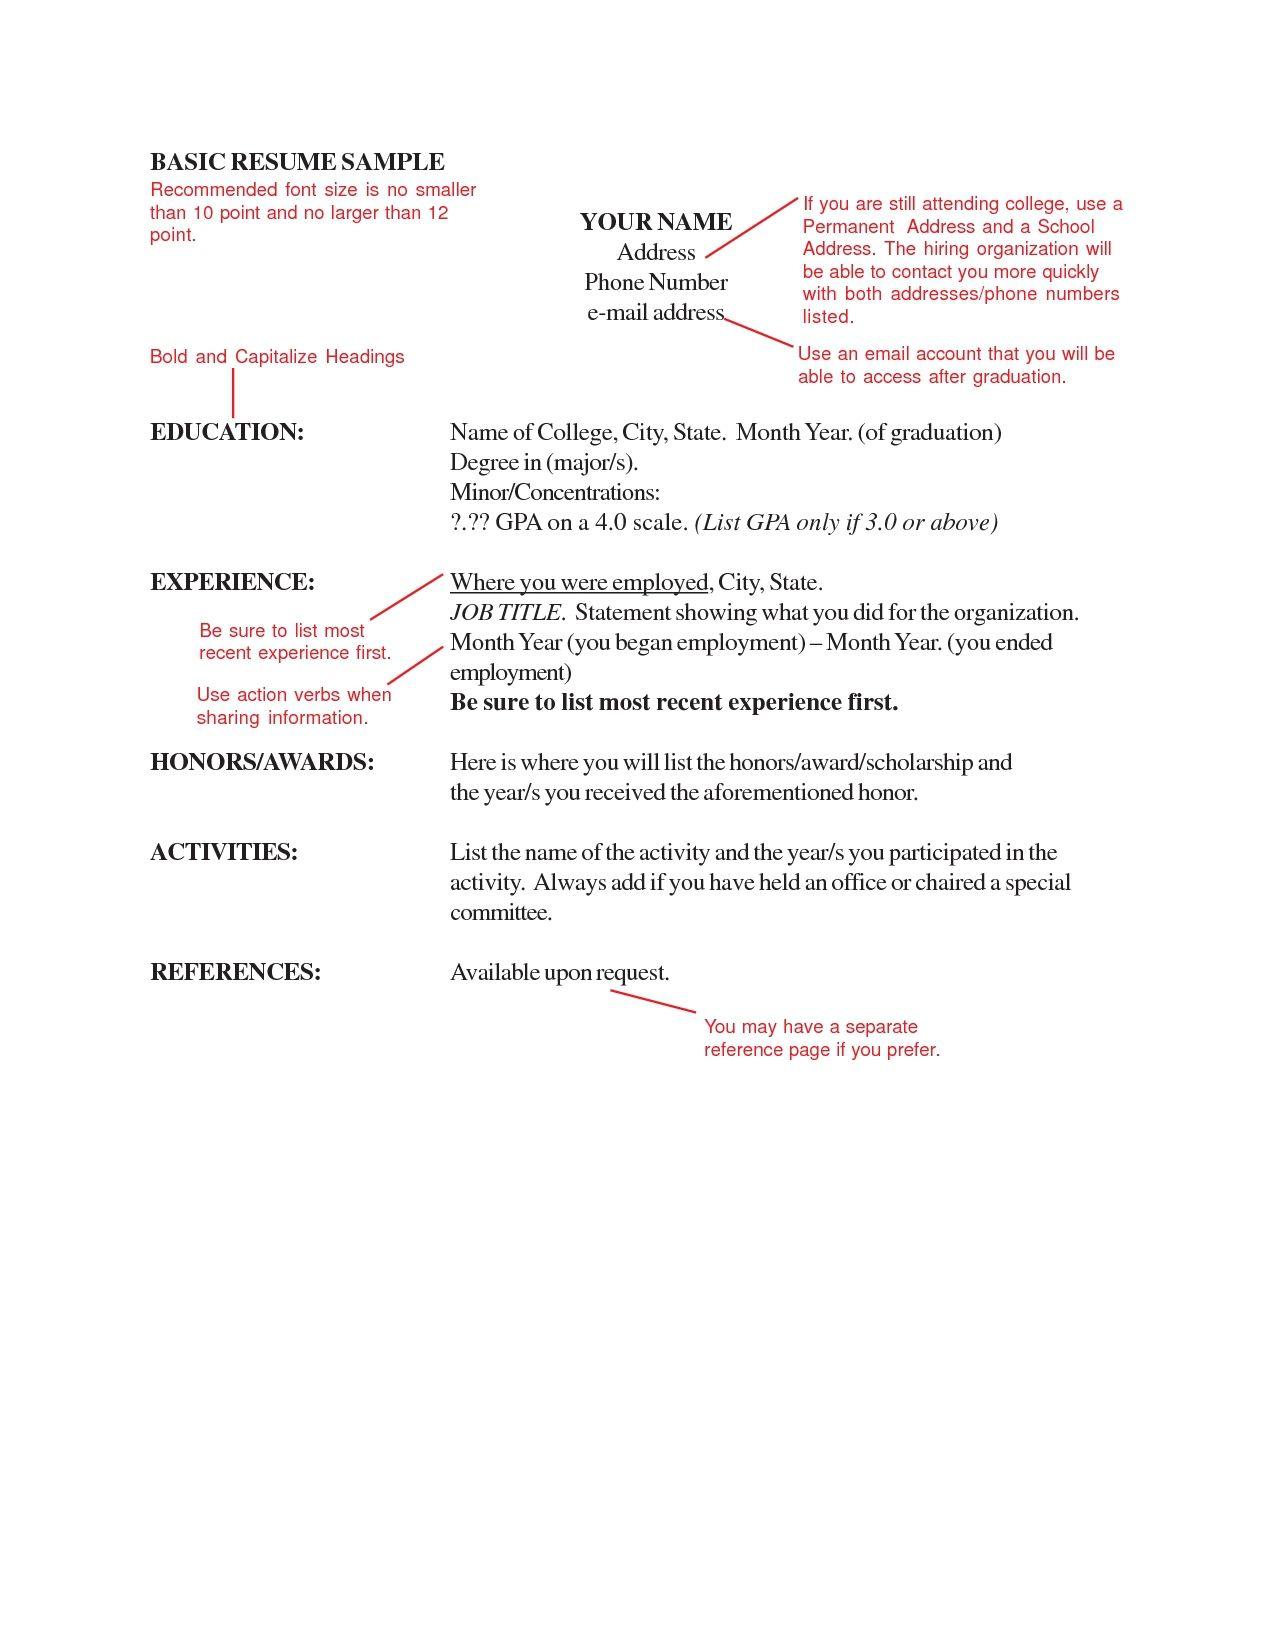 Letter Size Resume fonts, Resume design, Basic resume